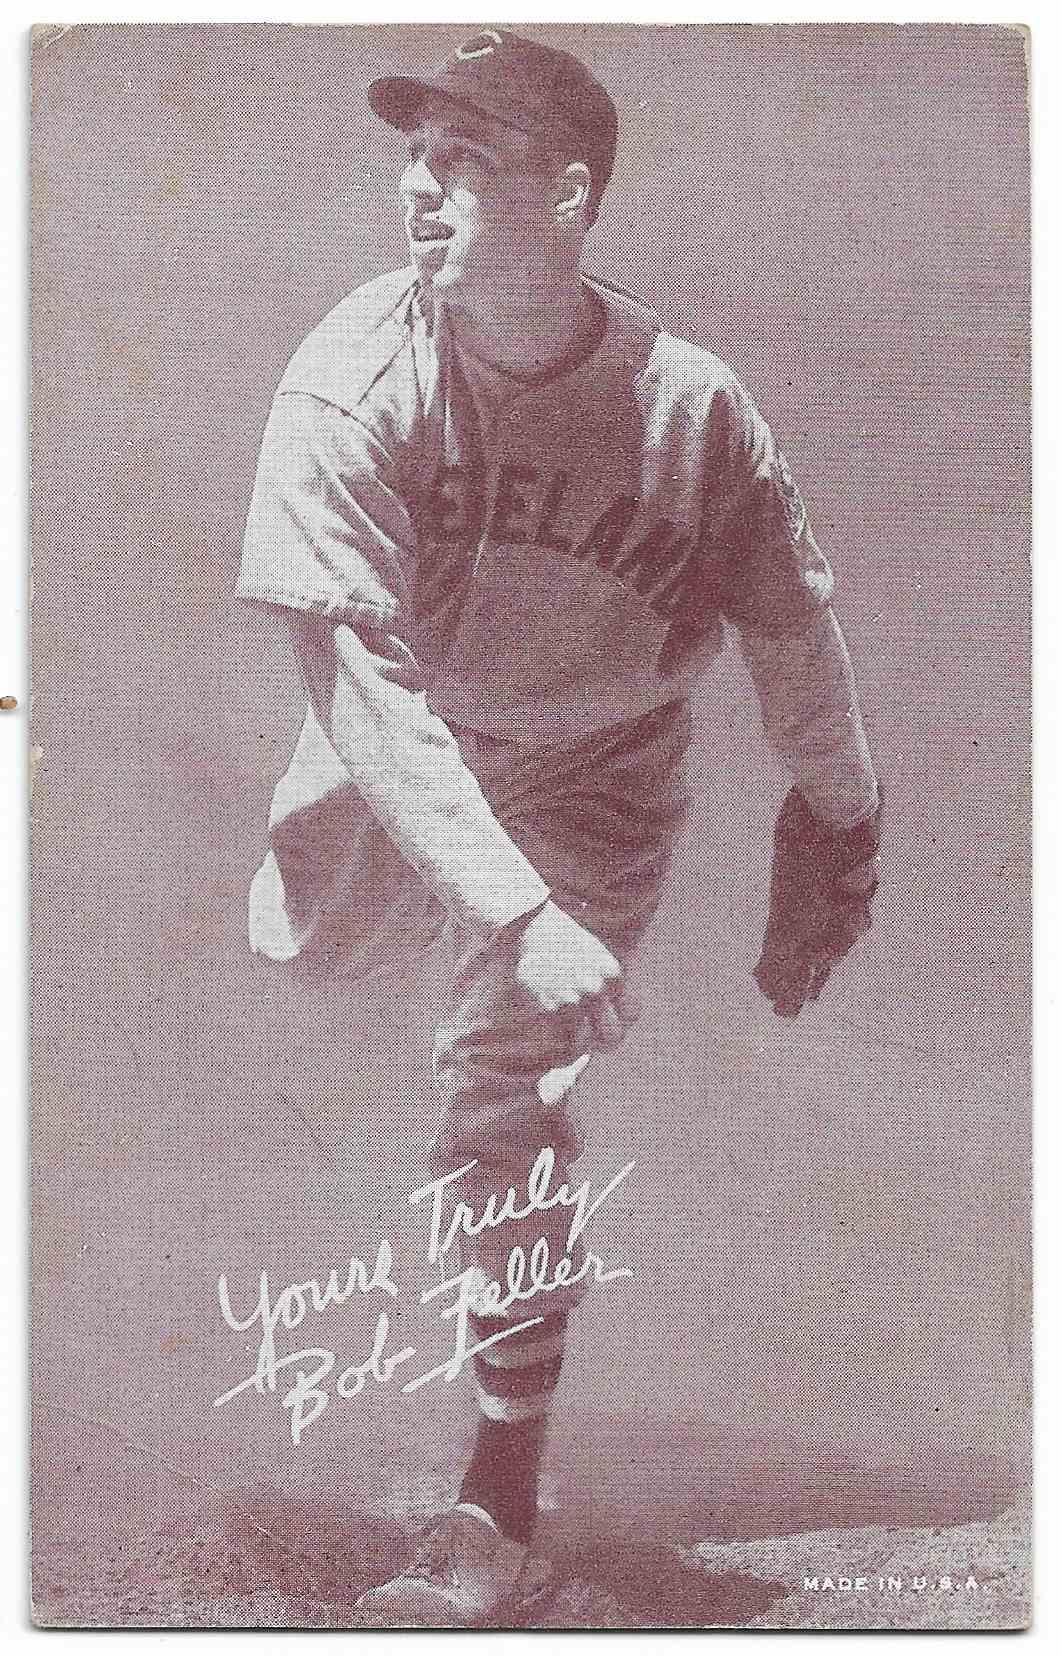 1947 Exhibits Bob Feller card front image